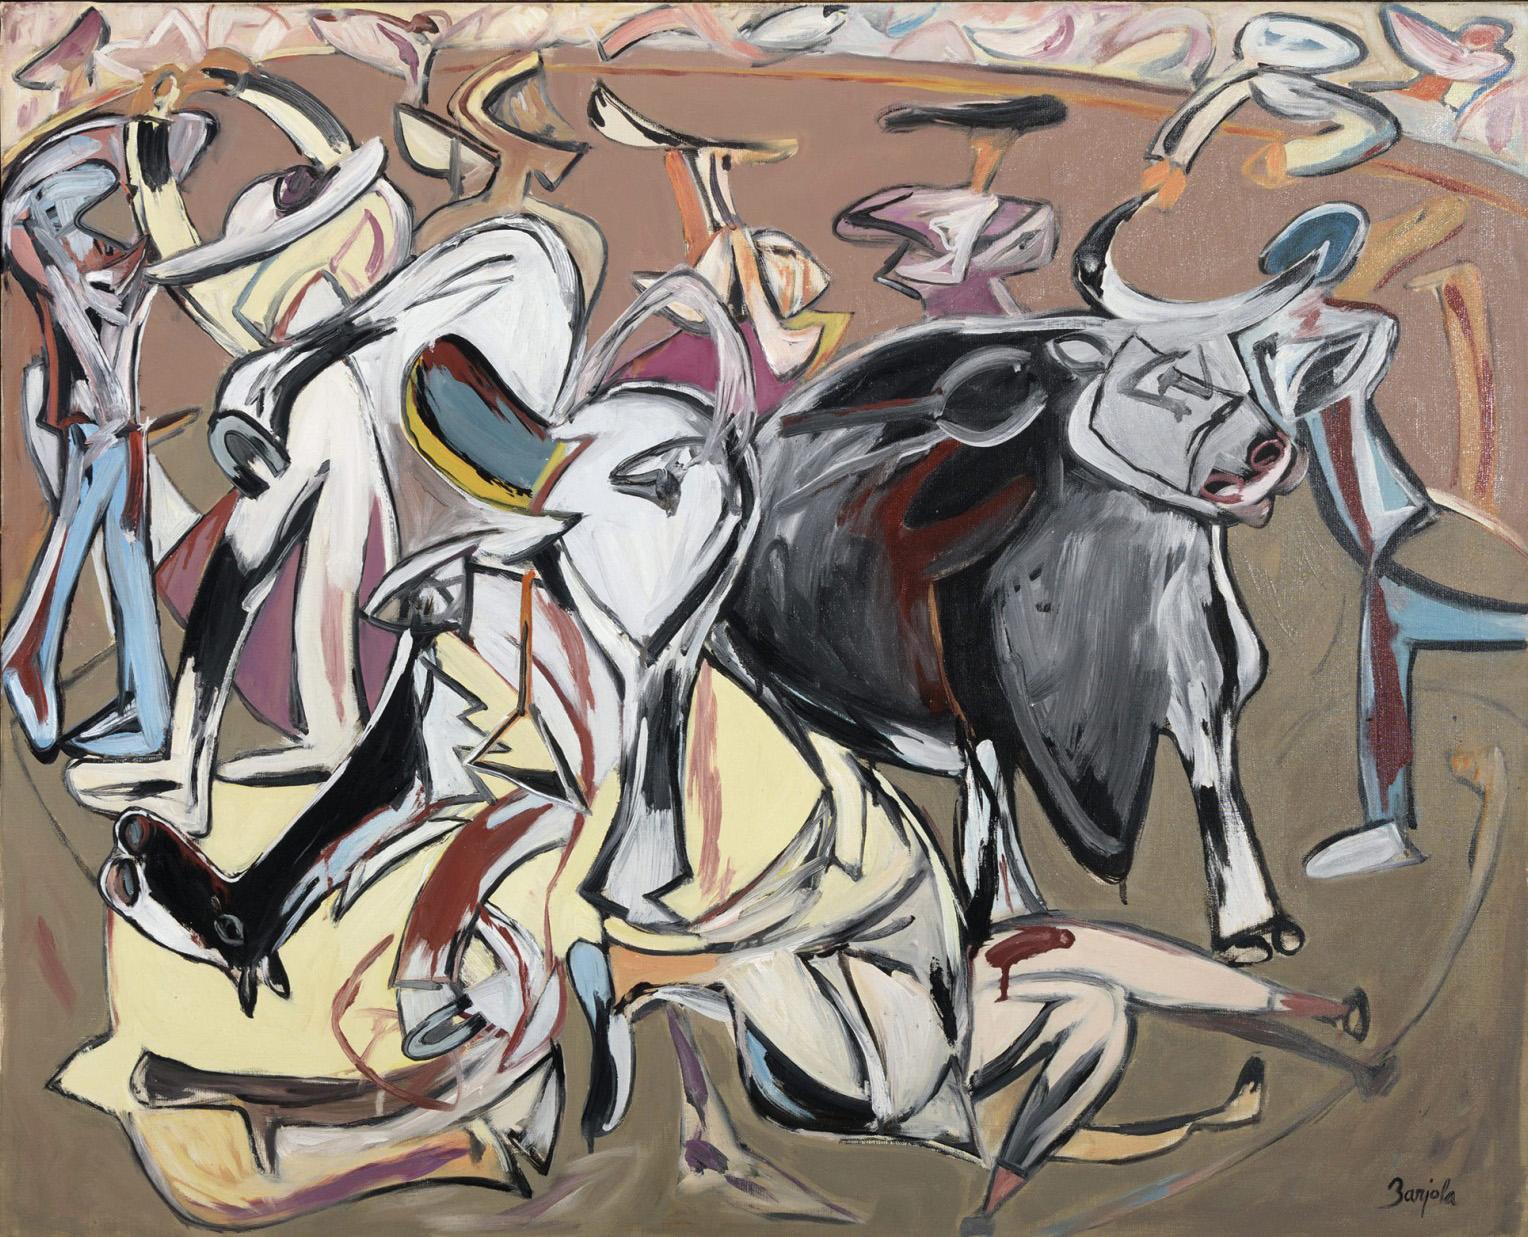 Juan Barjola. Tauromaquia, 1997. Salida: 30.000 euros. Remate: 35.500 euros